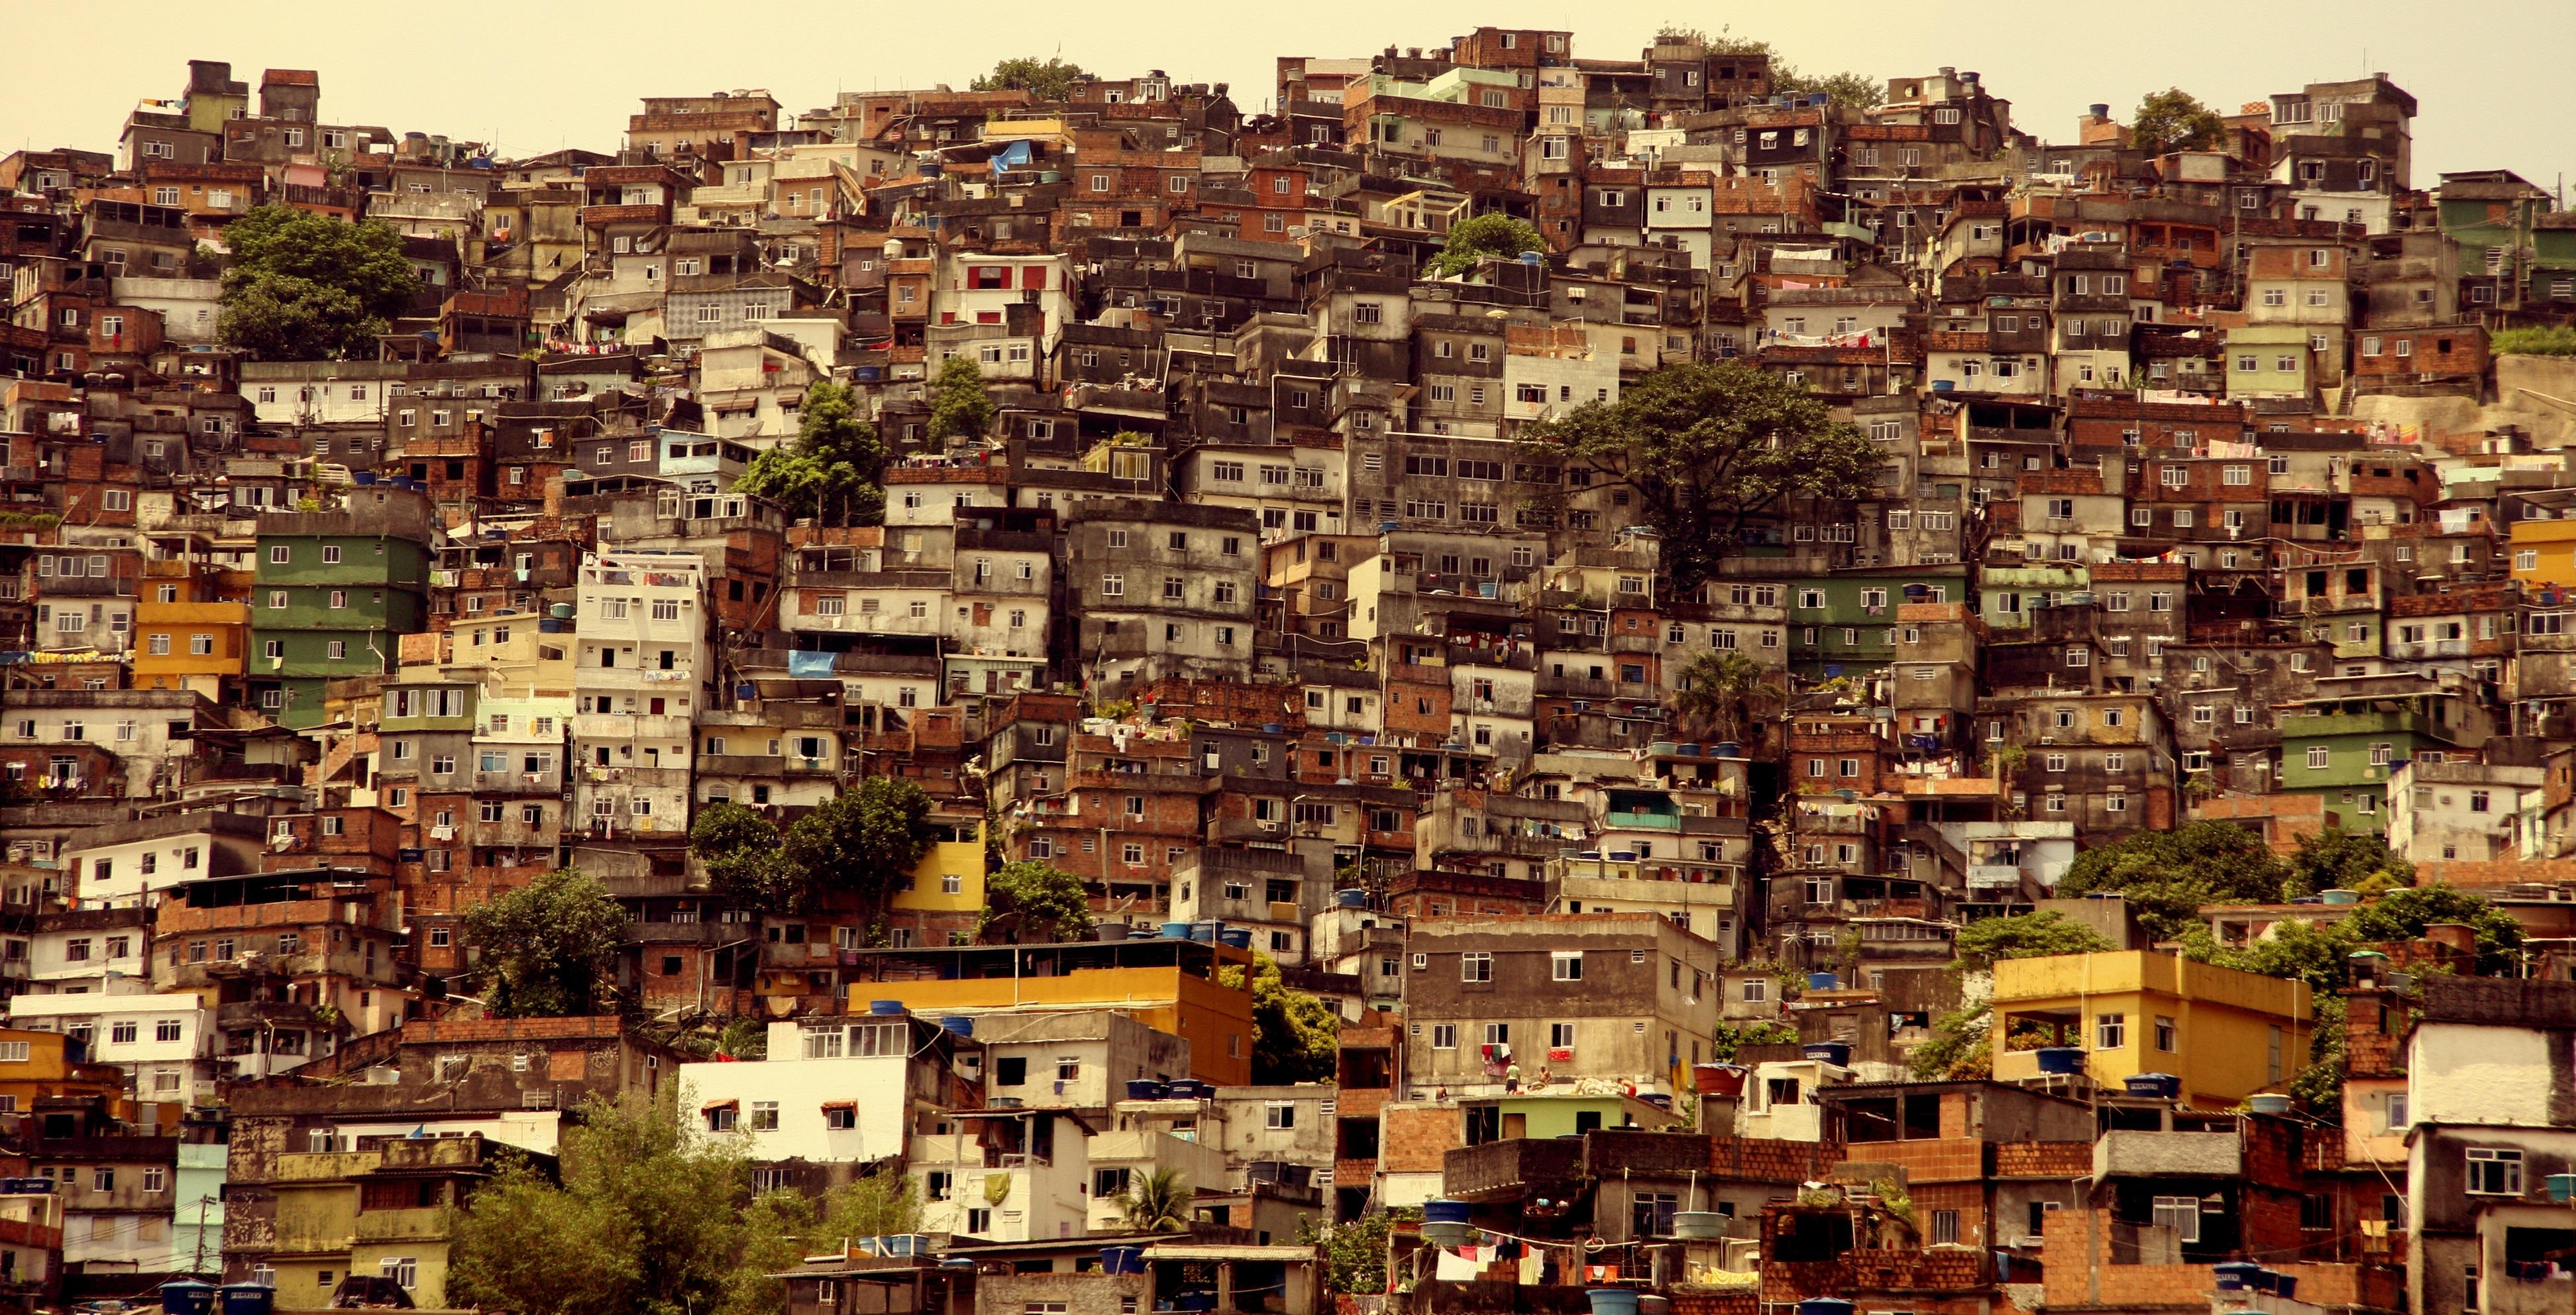 Flickr - favelascape - Alex